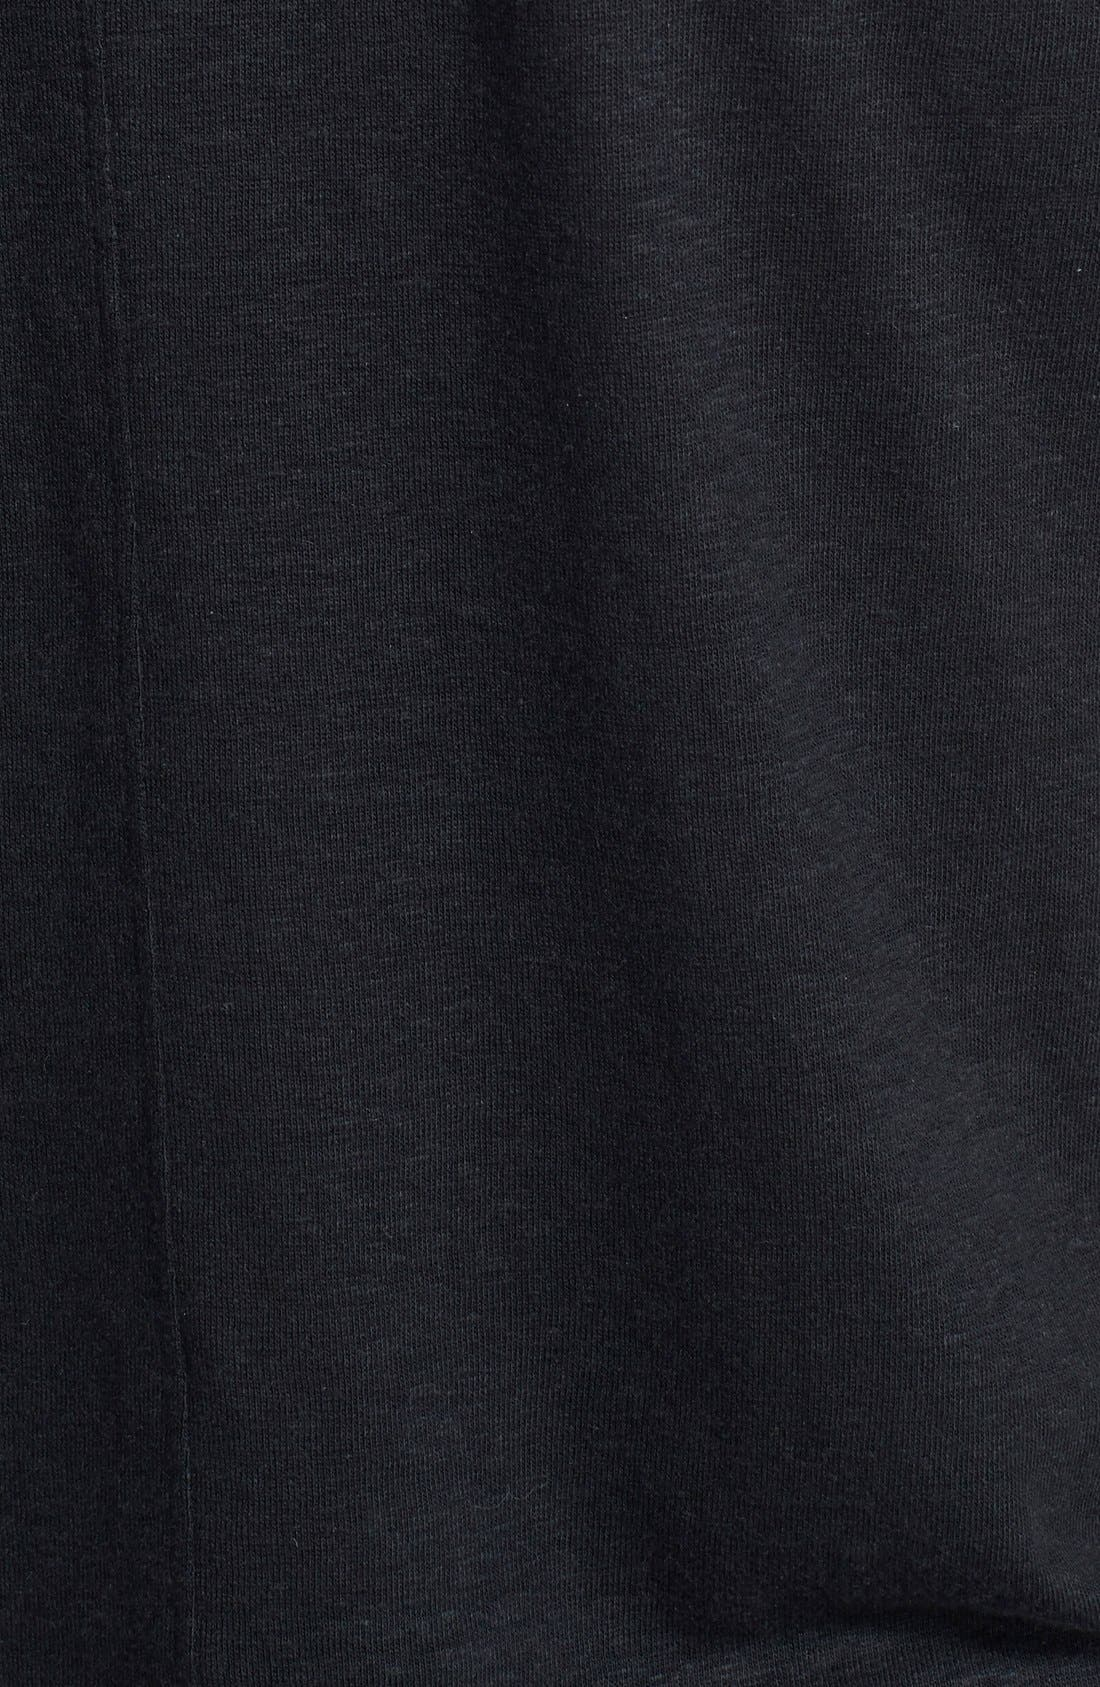 Pintuck V-Neck T-Shirt,                             Alternate thumbnail 2, color,                             001